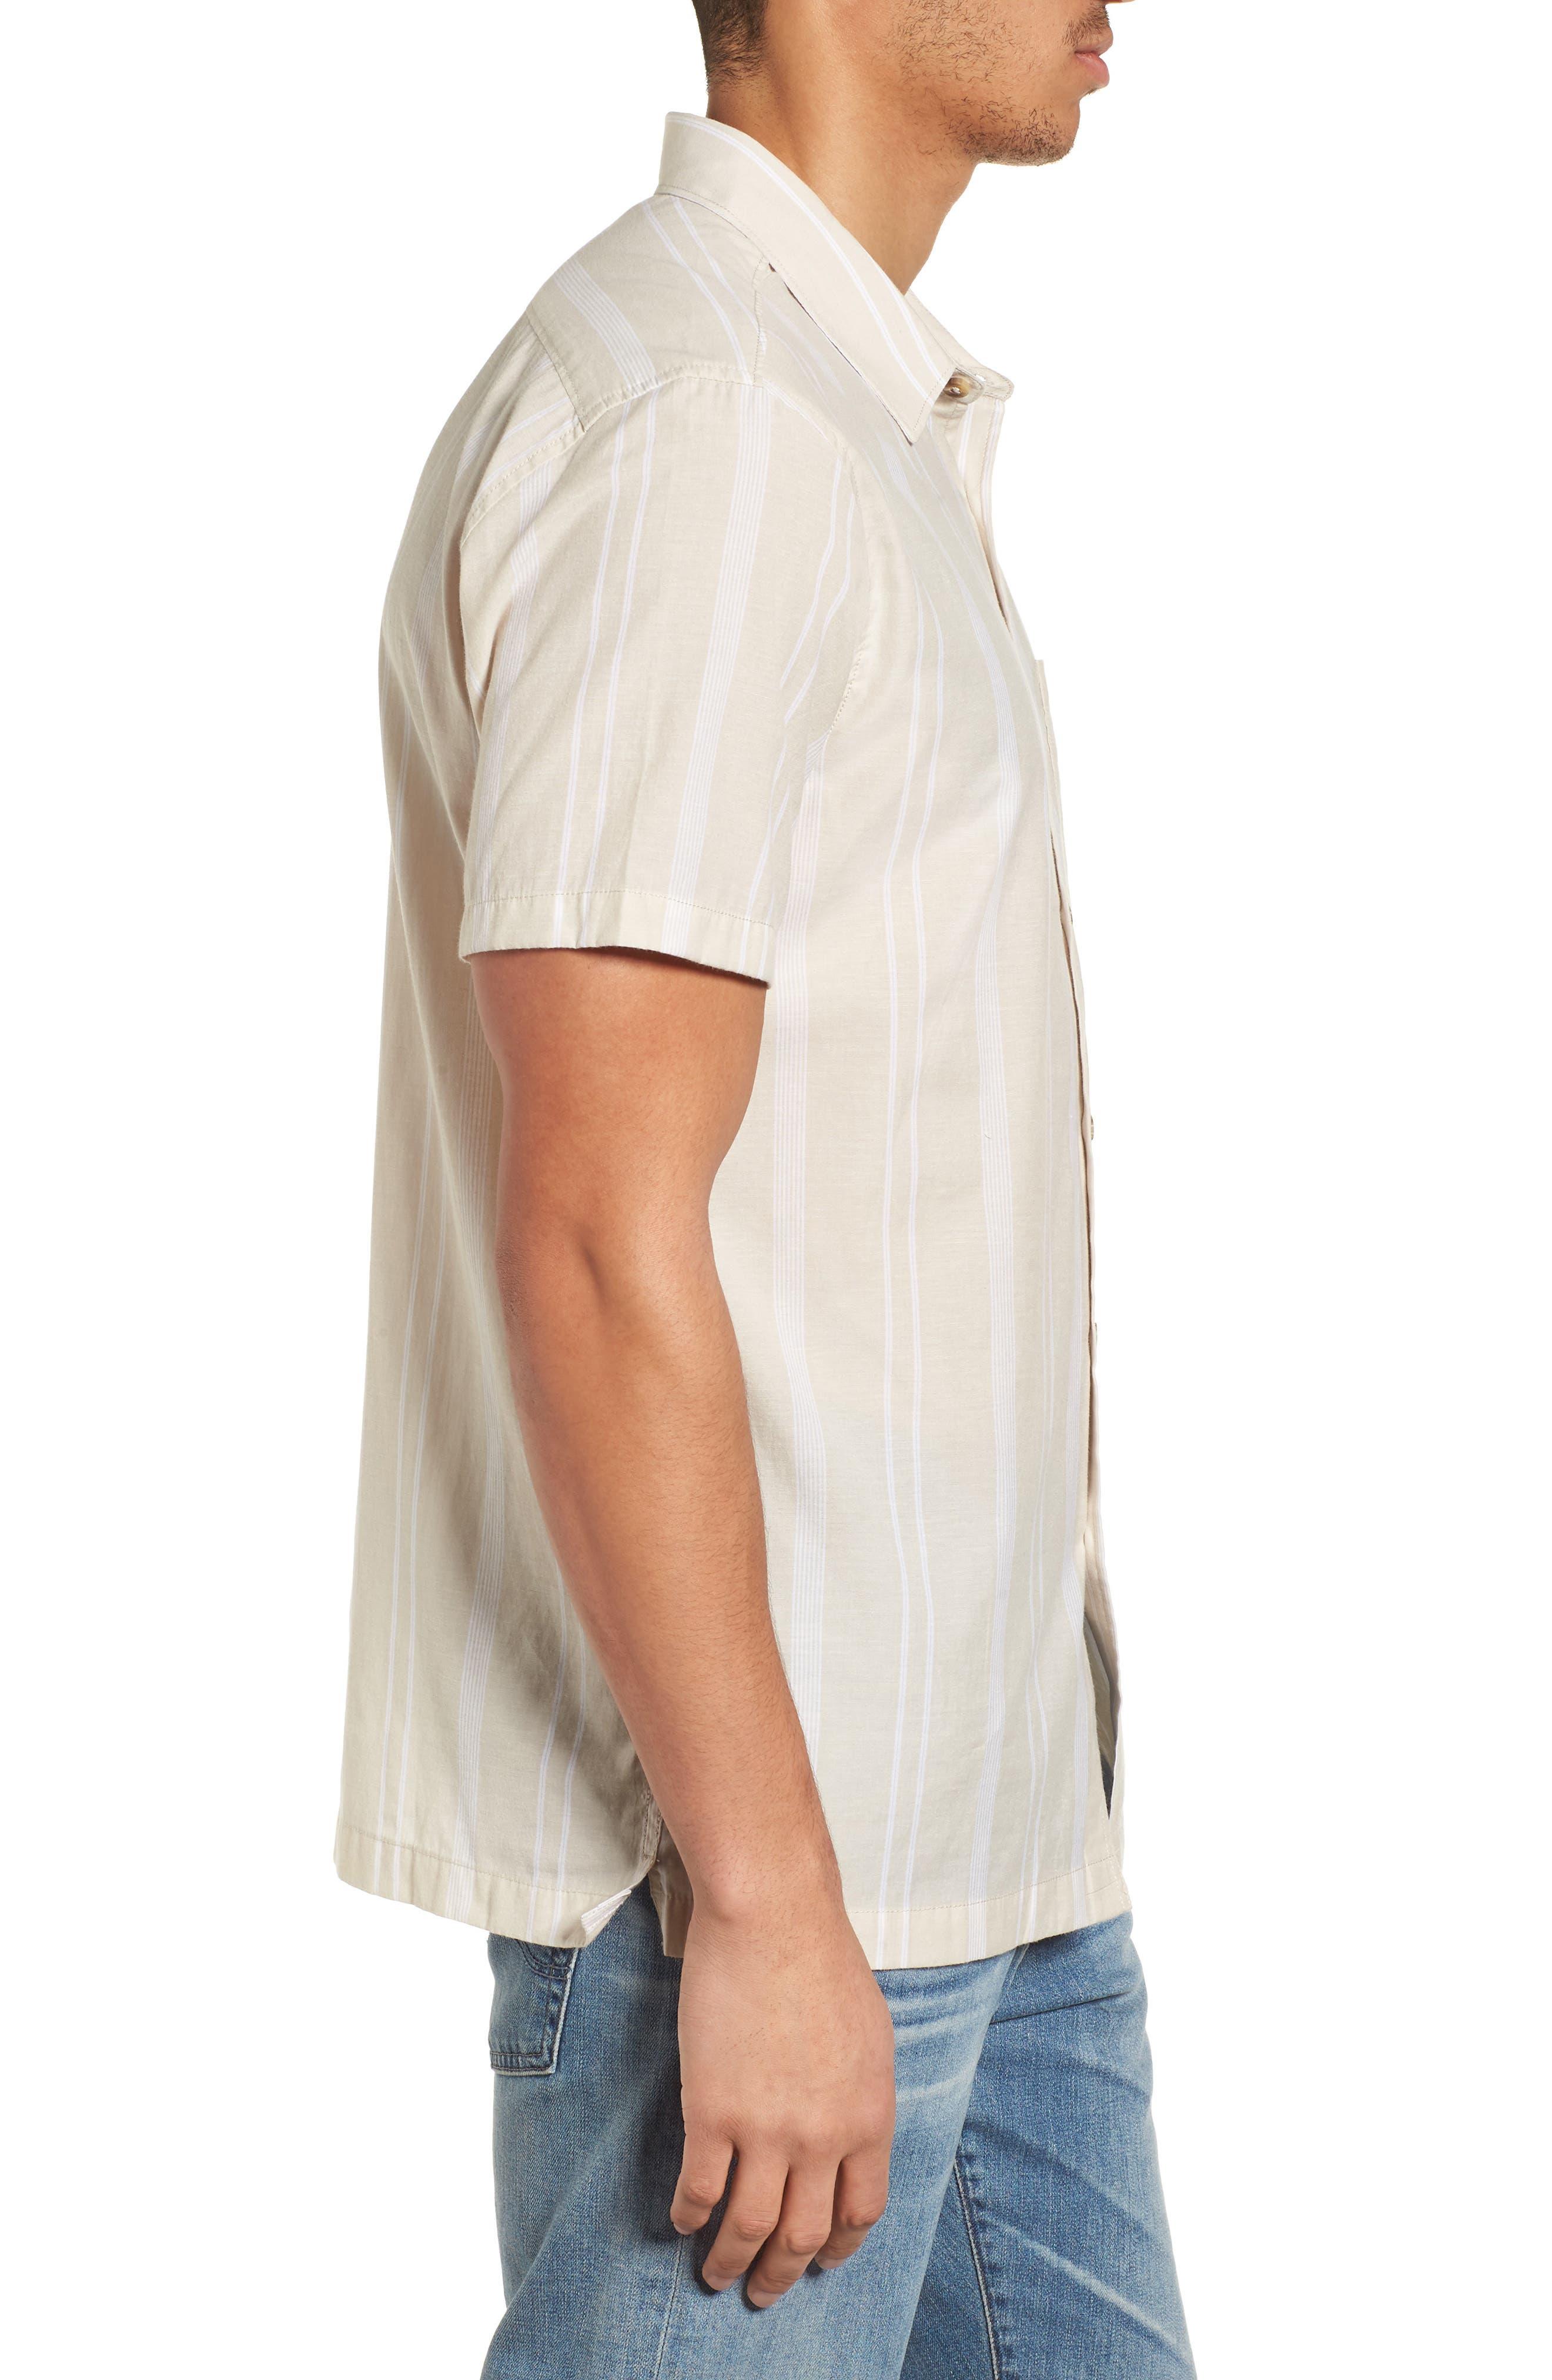 Donny Short Sleeve Shirt,                             Alternate thumbnail 4, color,                             Sand